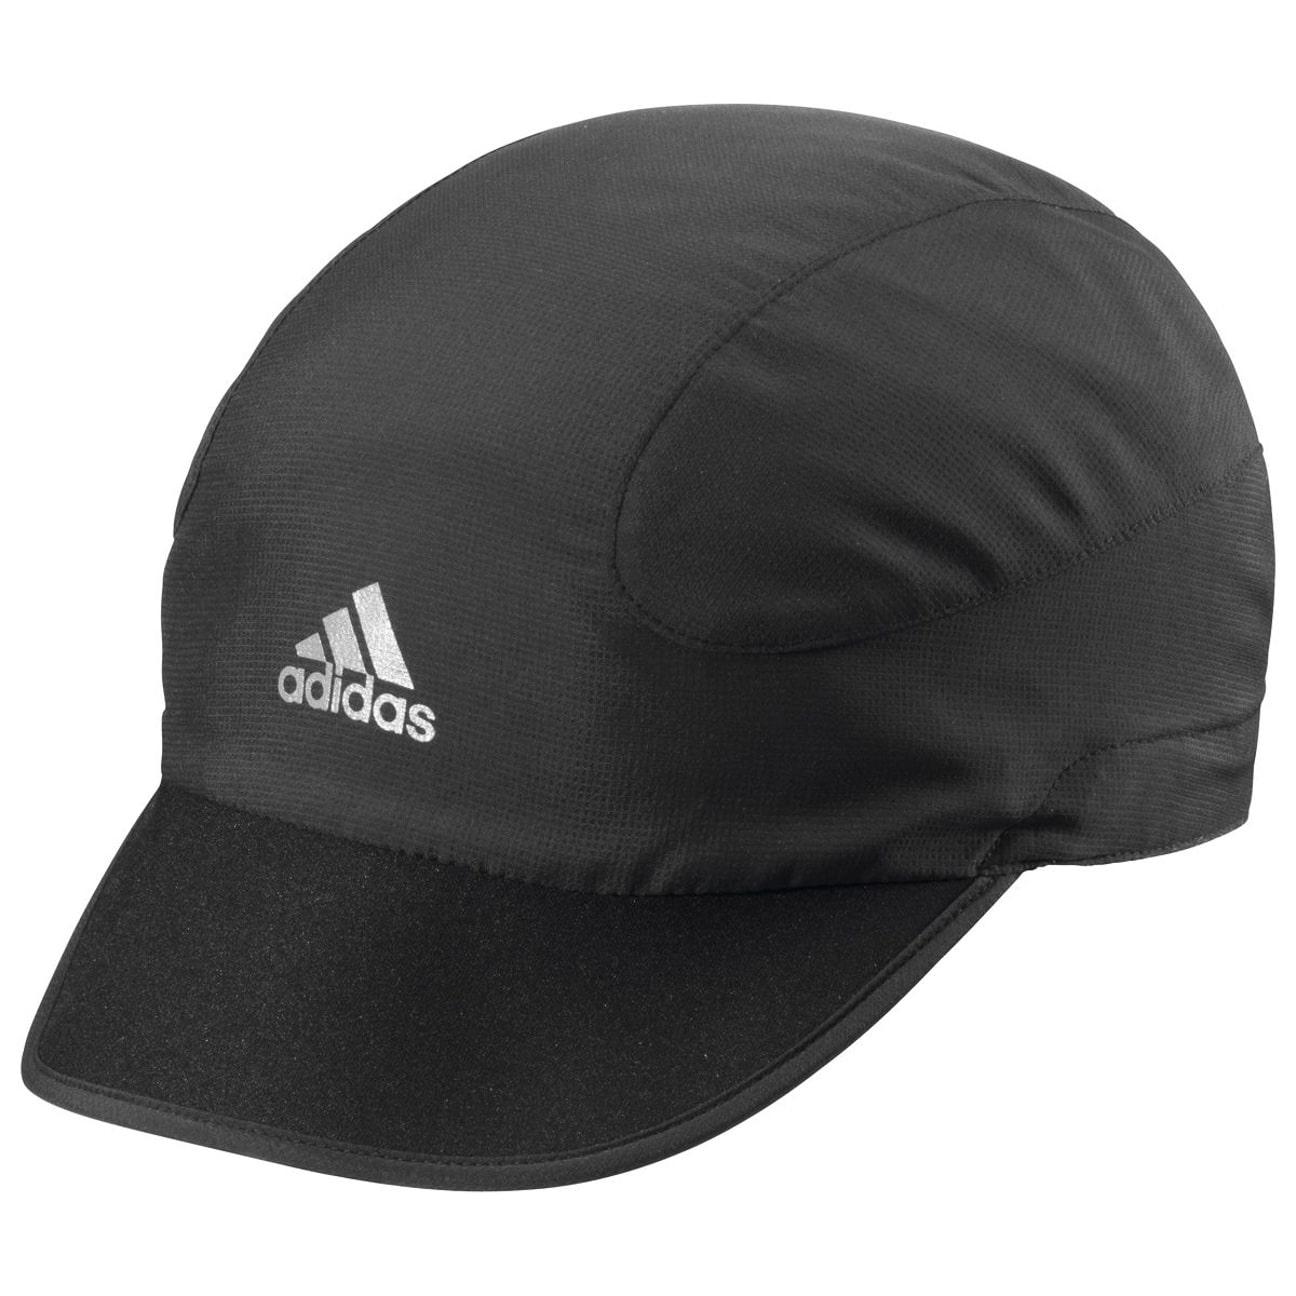 5205fecbef3a0 Gorra Light by adidas - Gorros - sombreroshop.es